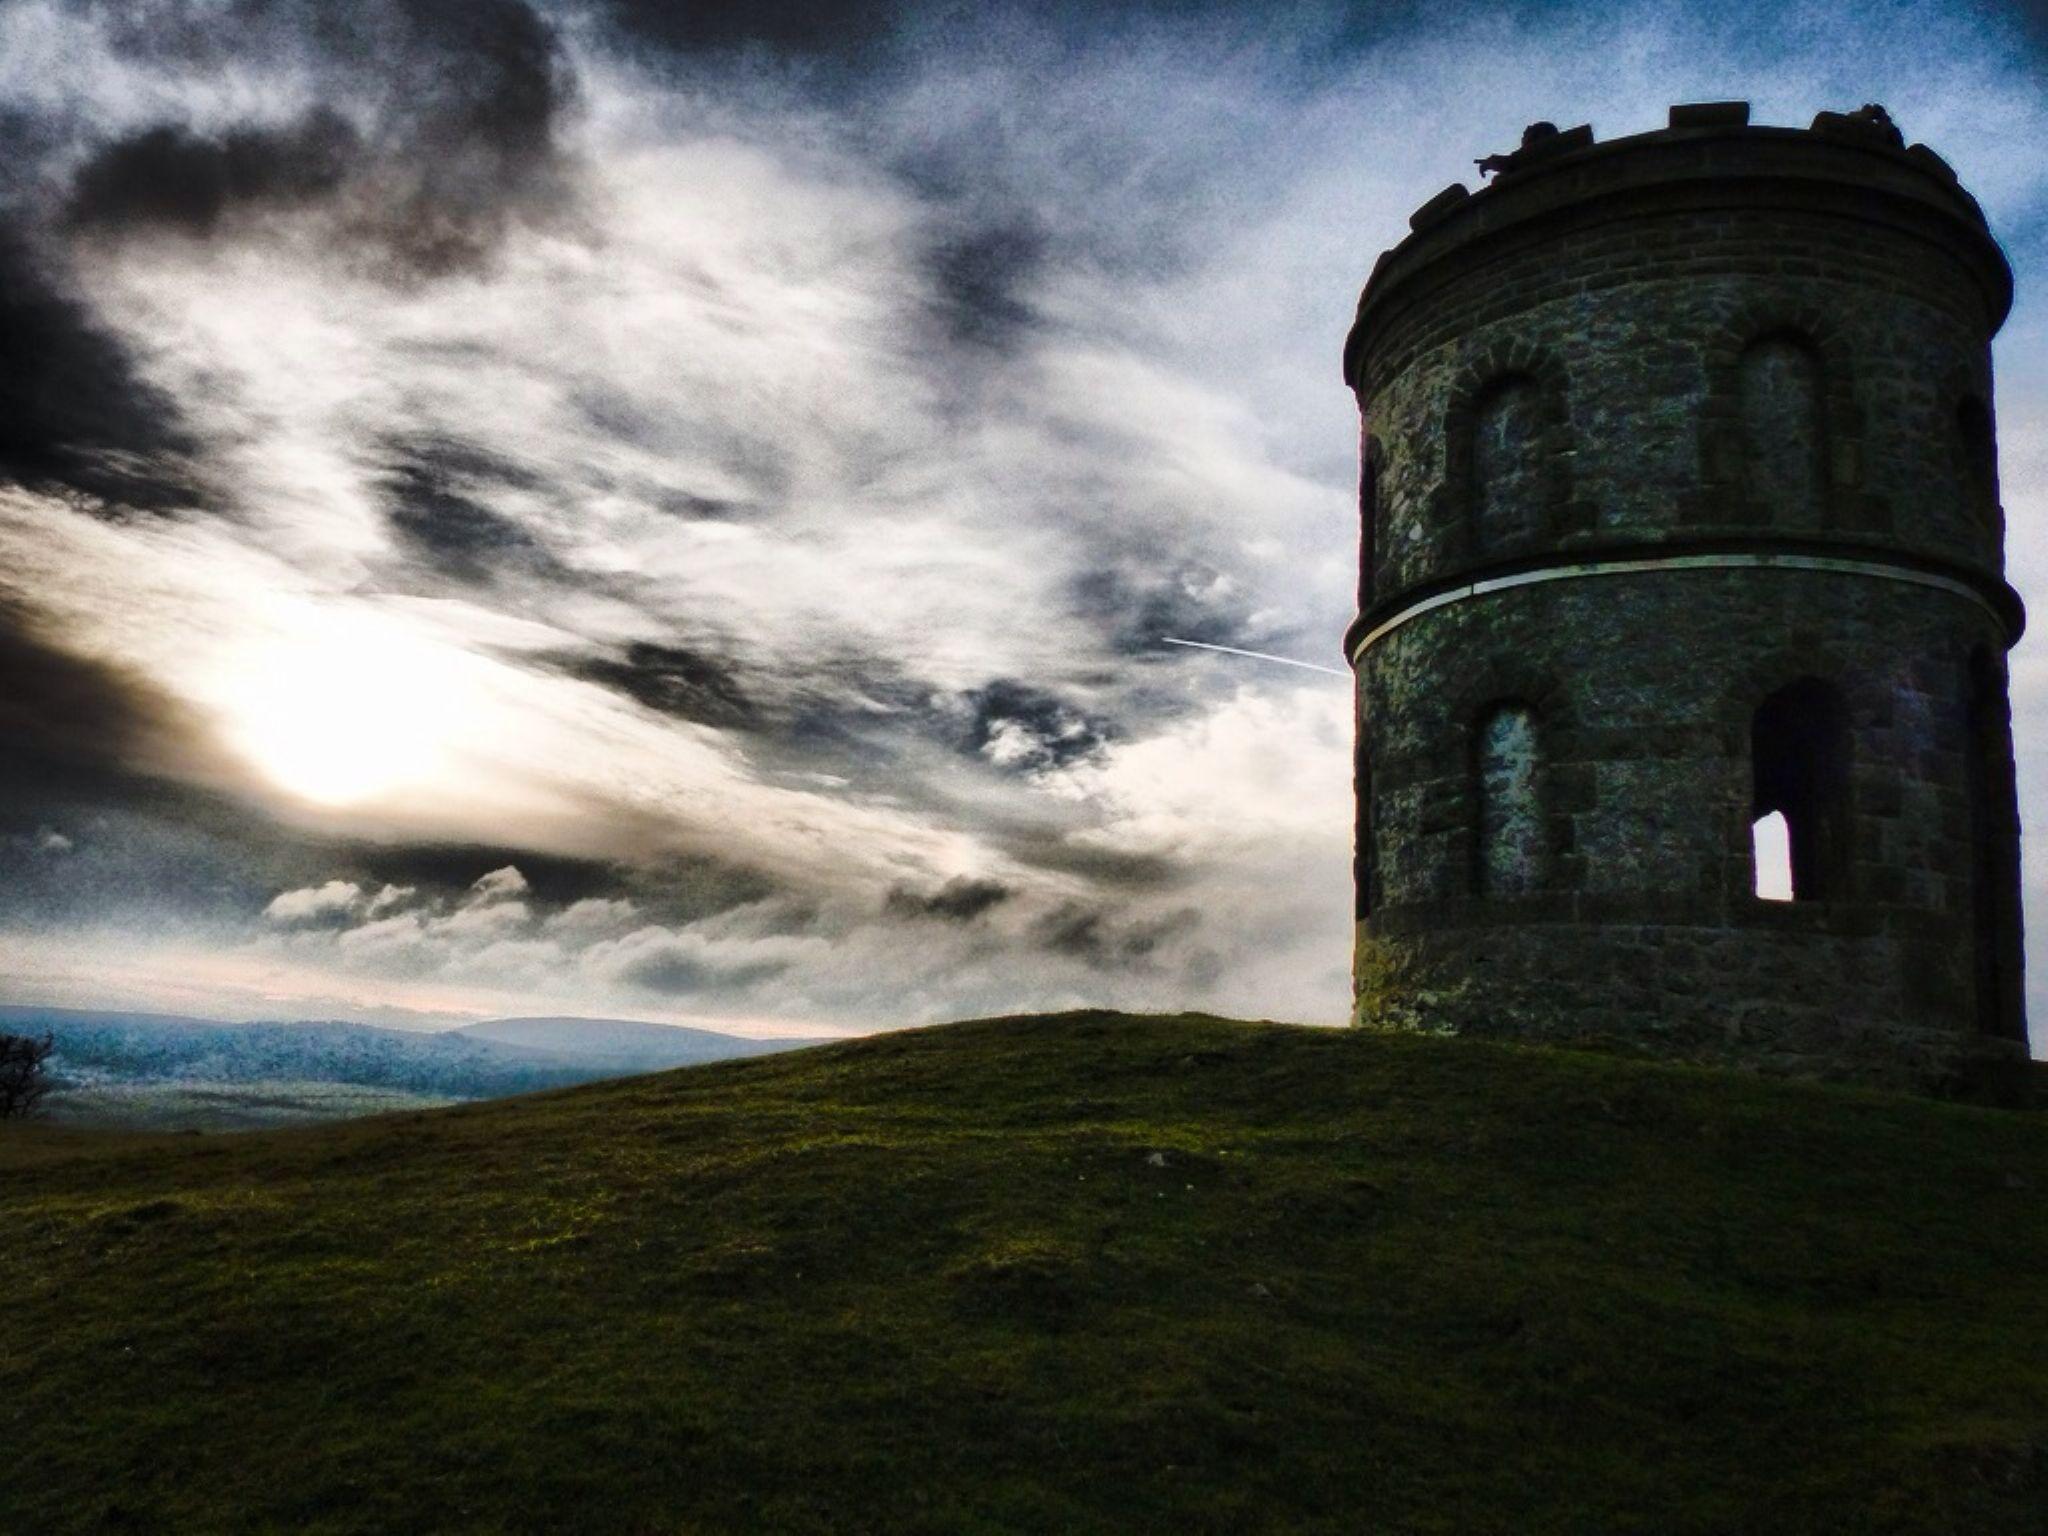 Grinlow Tower,(Solomons Temple) Buxton, Derbyshire. by john.bradburn